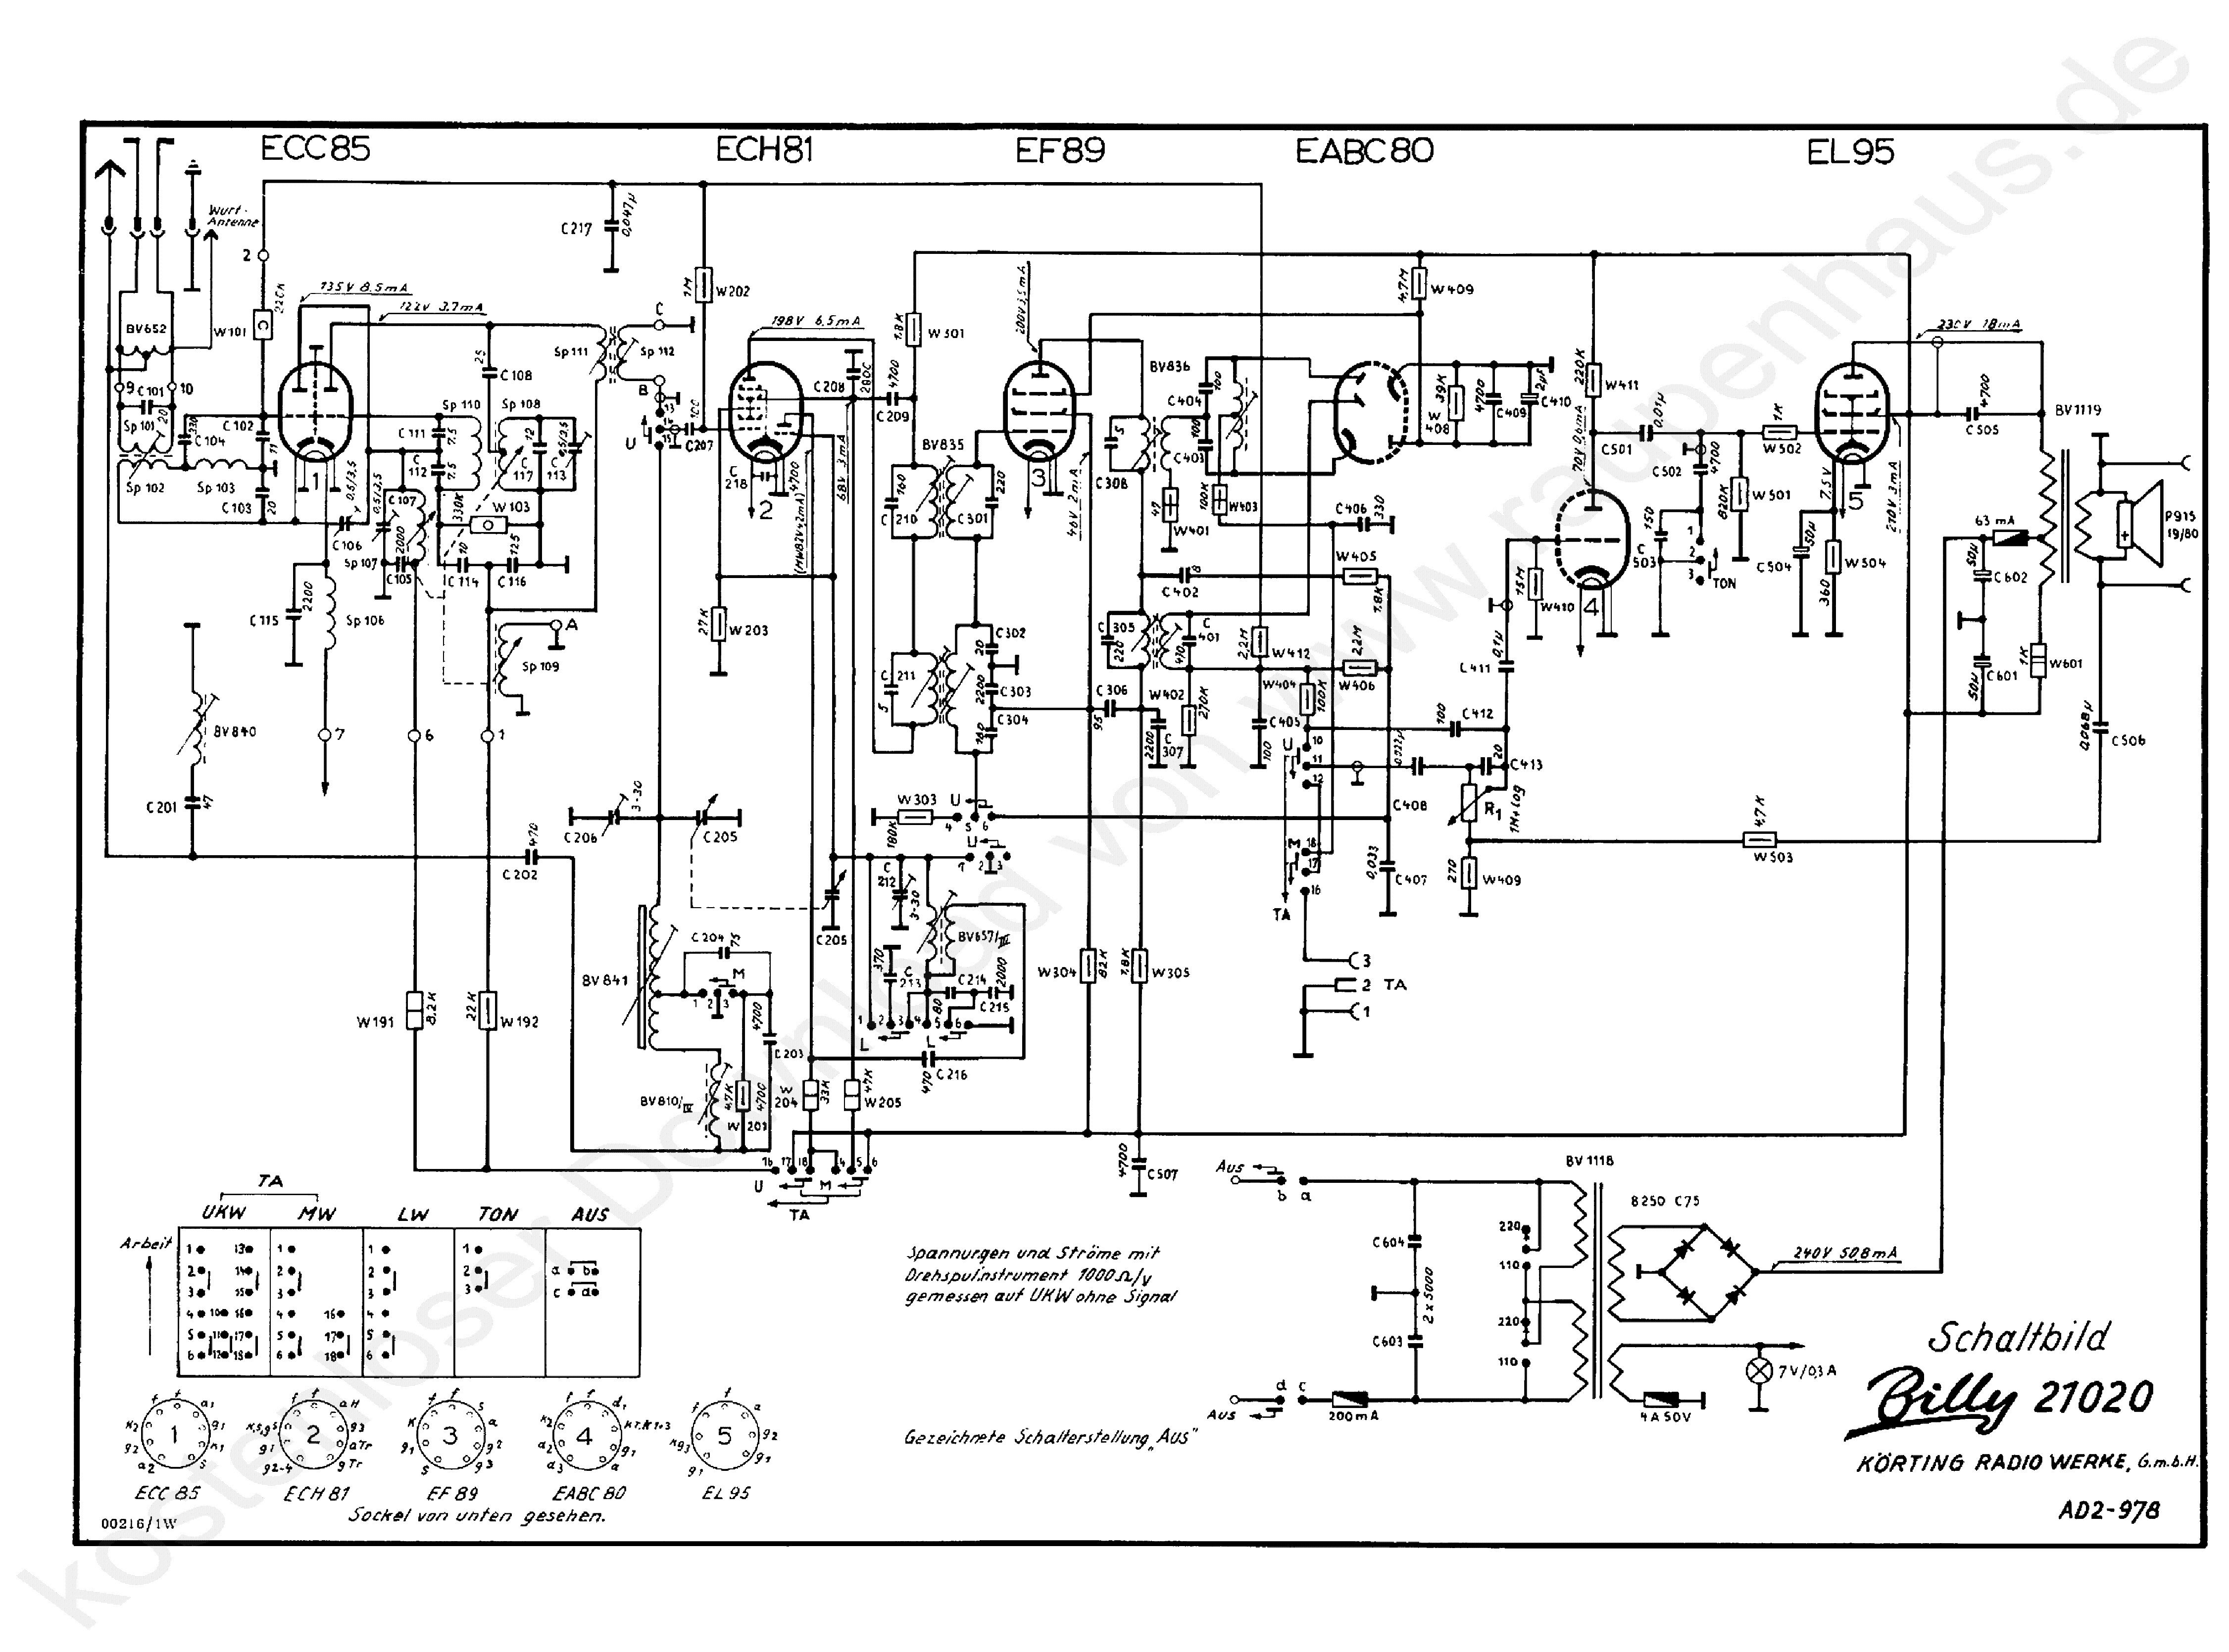 koerting billy 21020 radio 1960 sch service manual